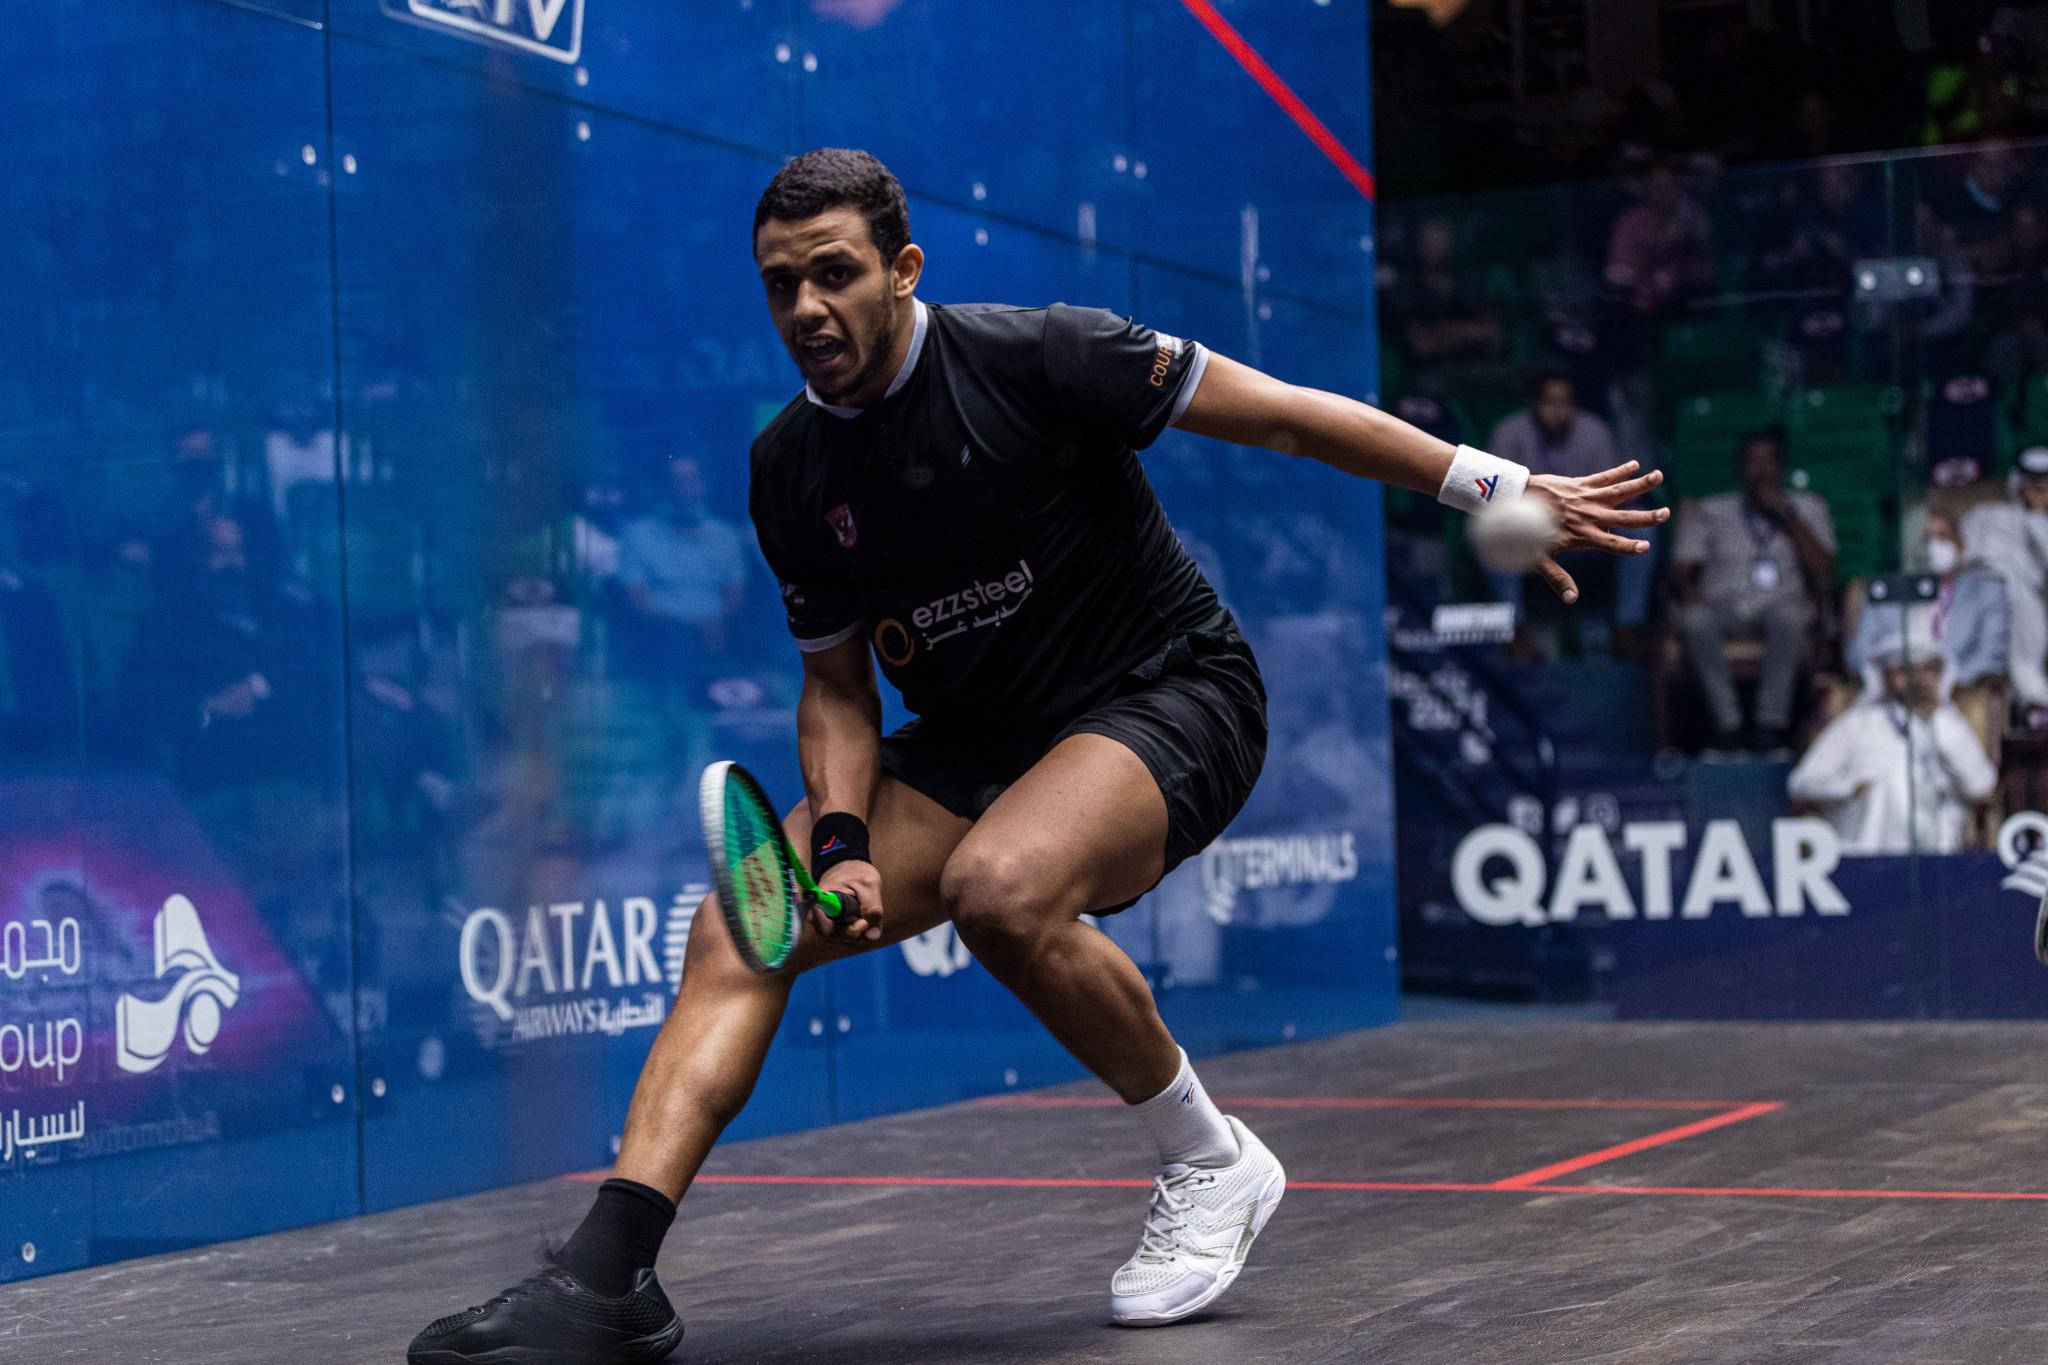 Asal upsets Momen again to reach Qatar Classic semi-finals